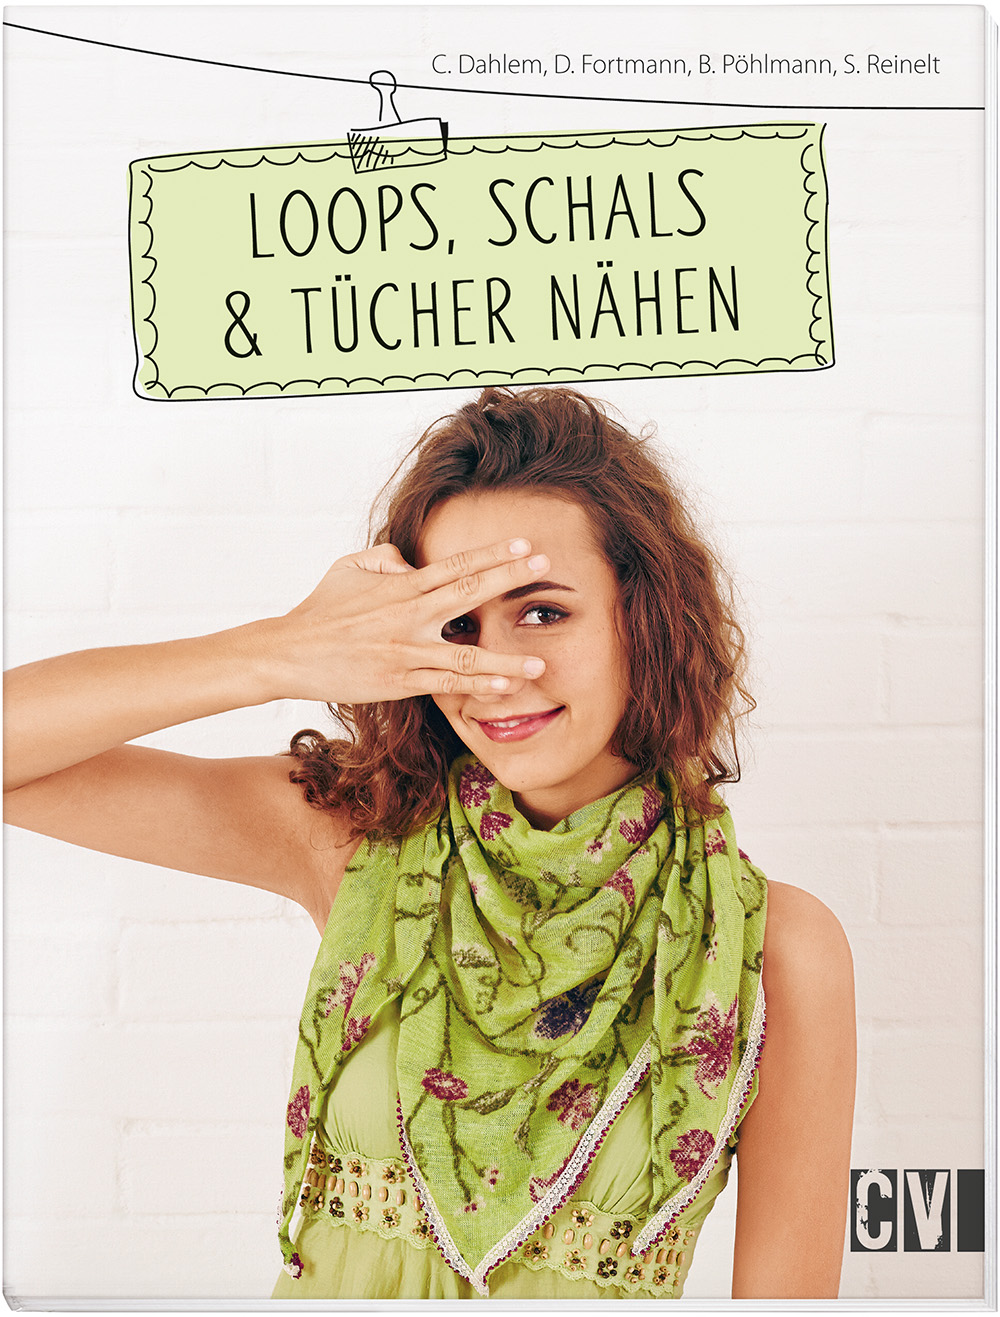 CV 6355 Loops, Schals & Tücher